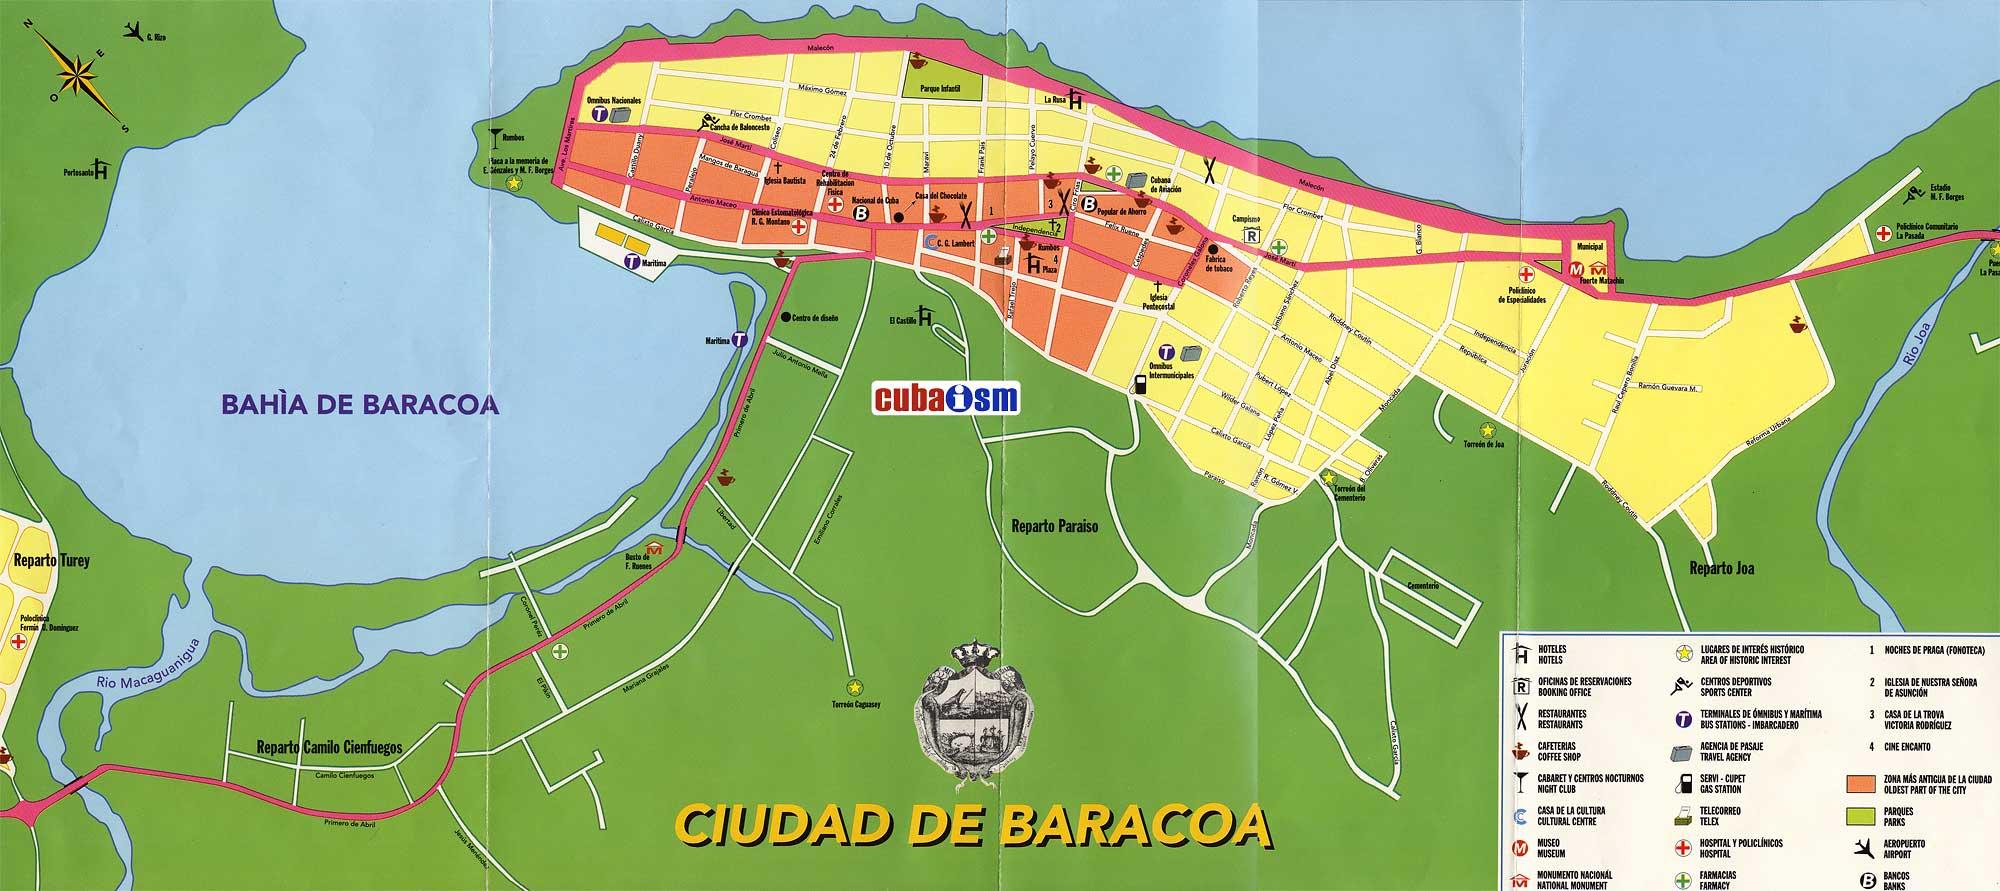 Baracoa première capitale de Cuba   Baracoa mode d'emploi